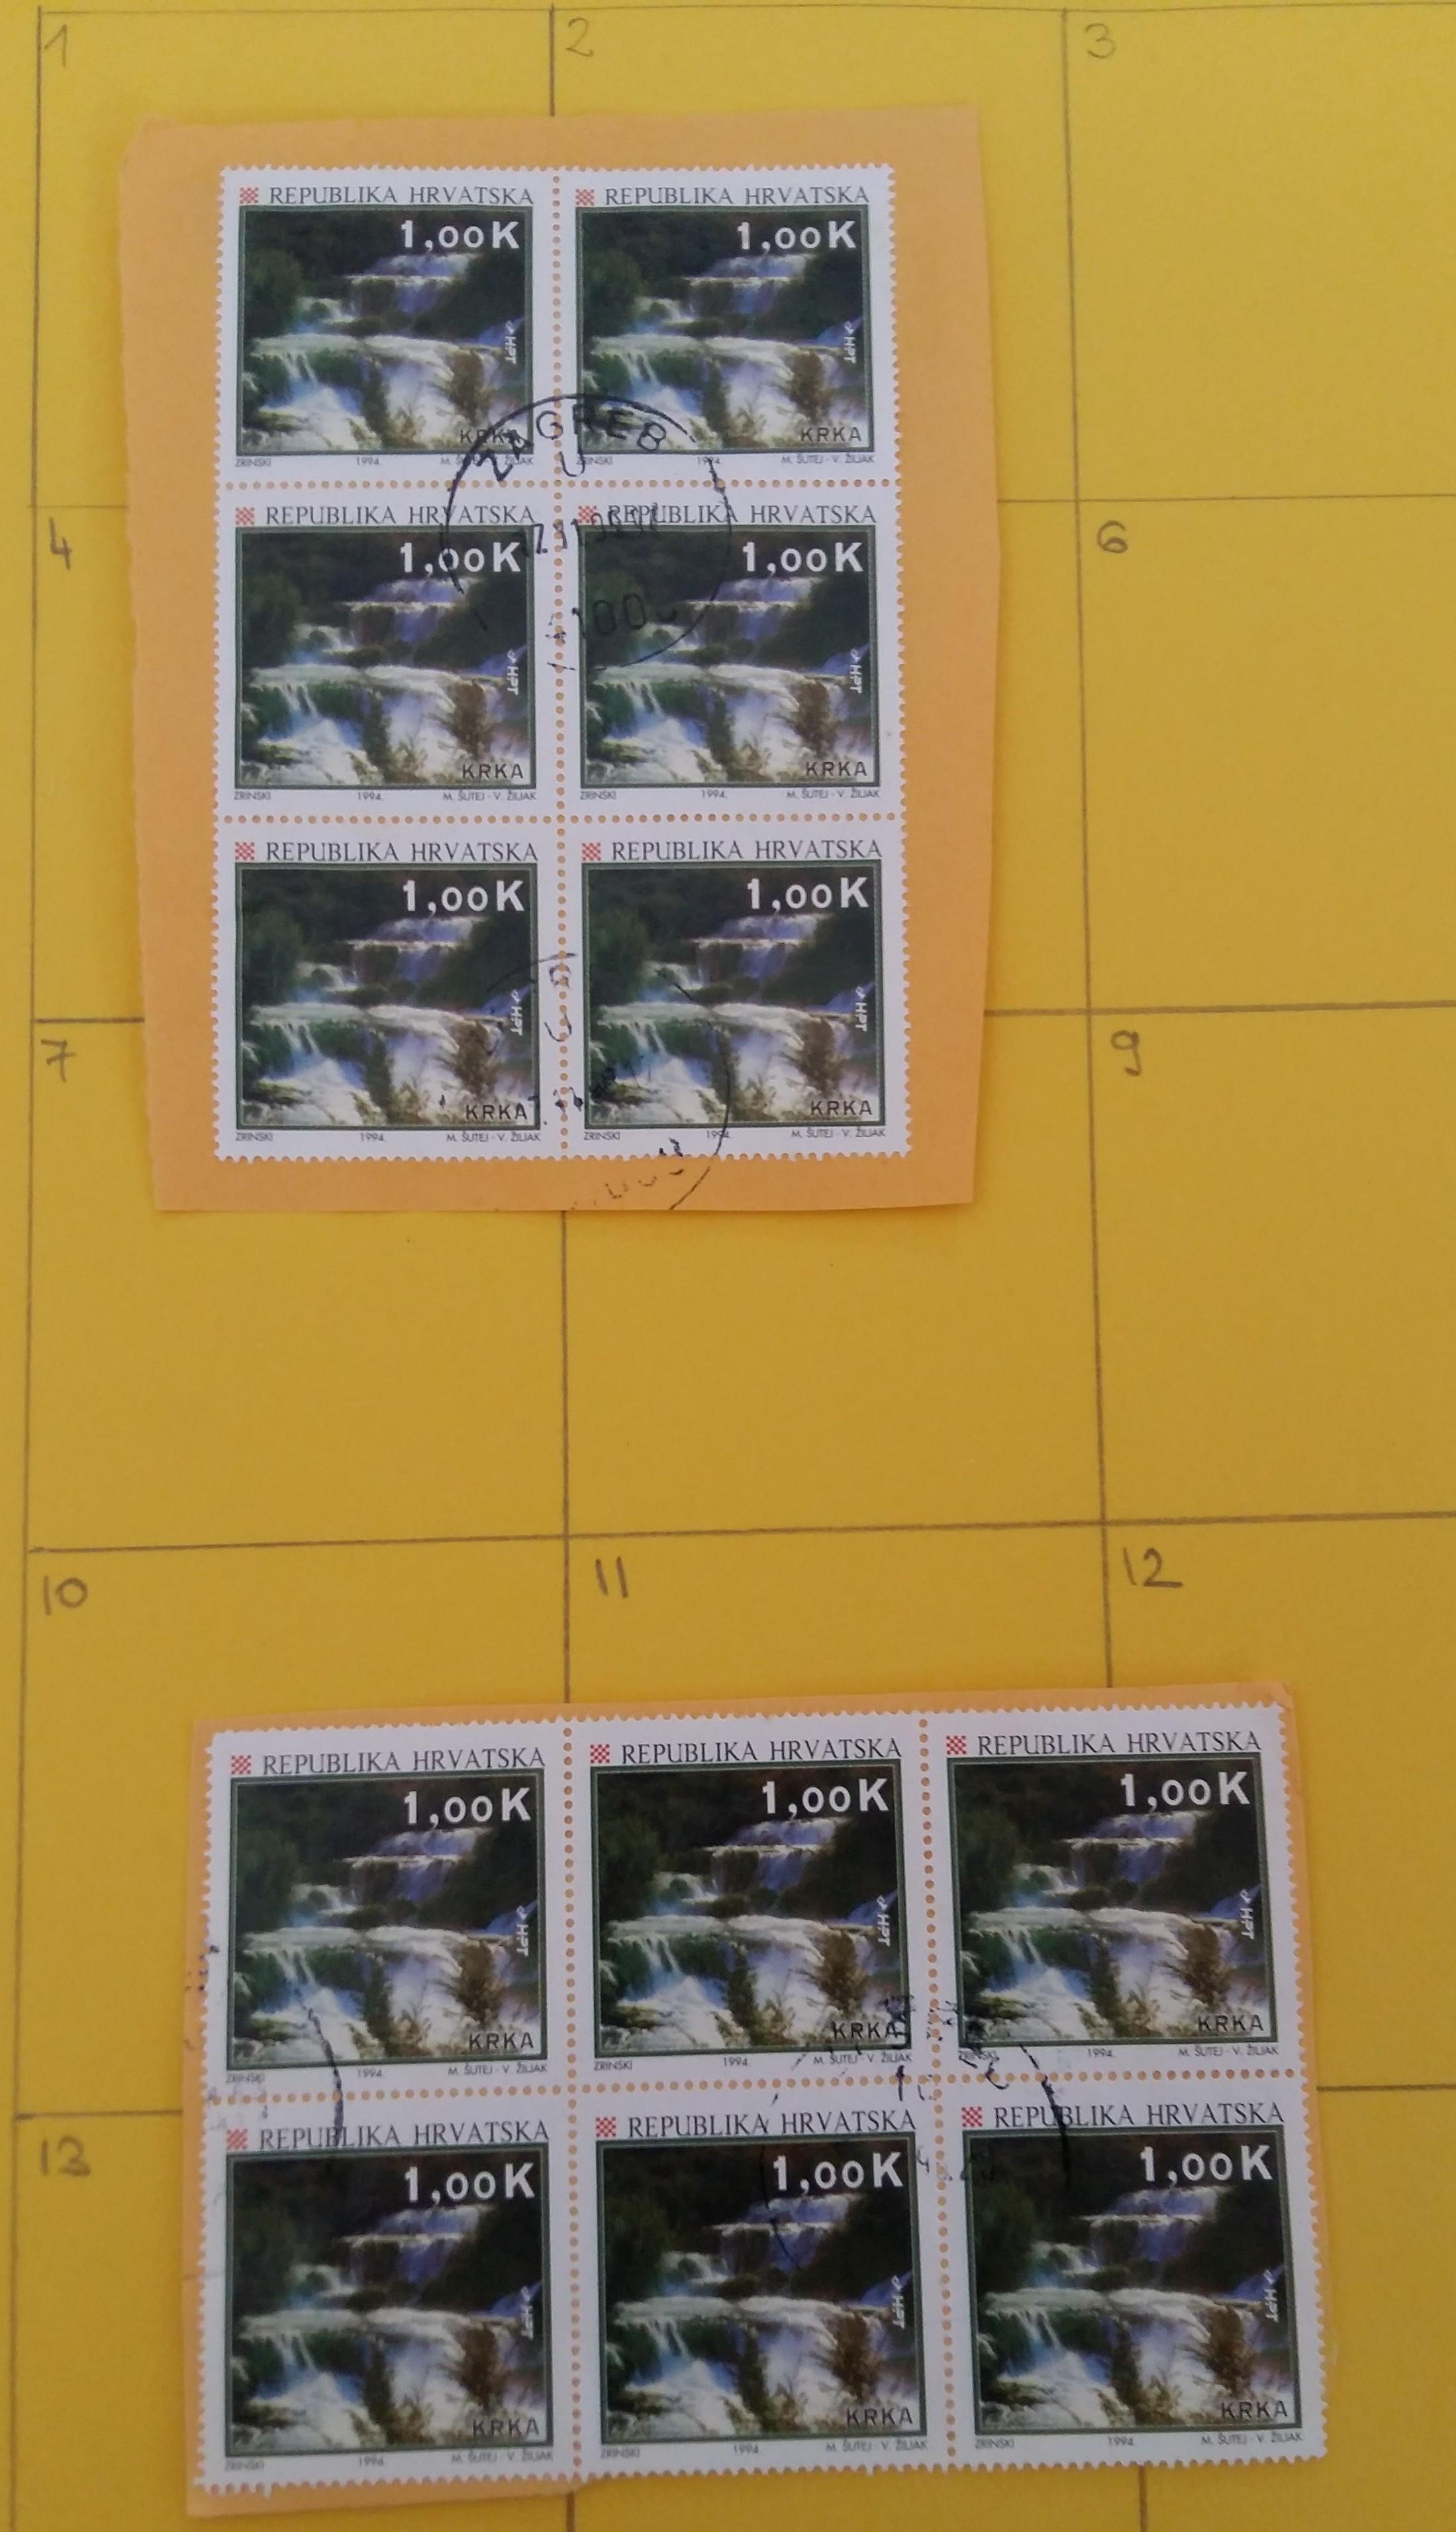 Croatia double stamps 20190928-141825